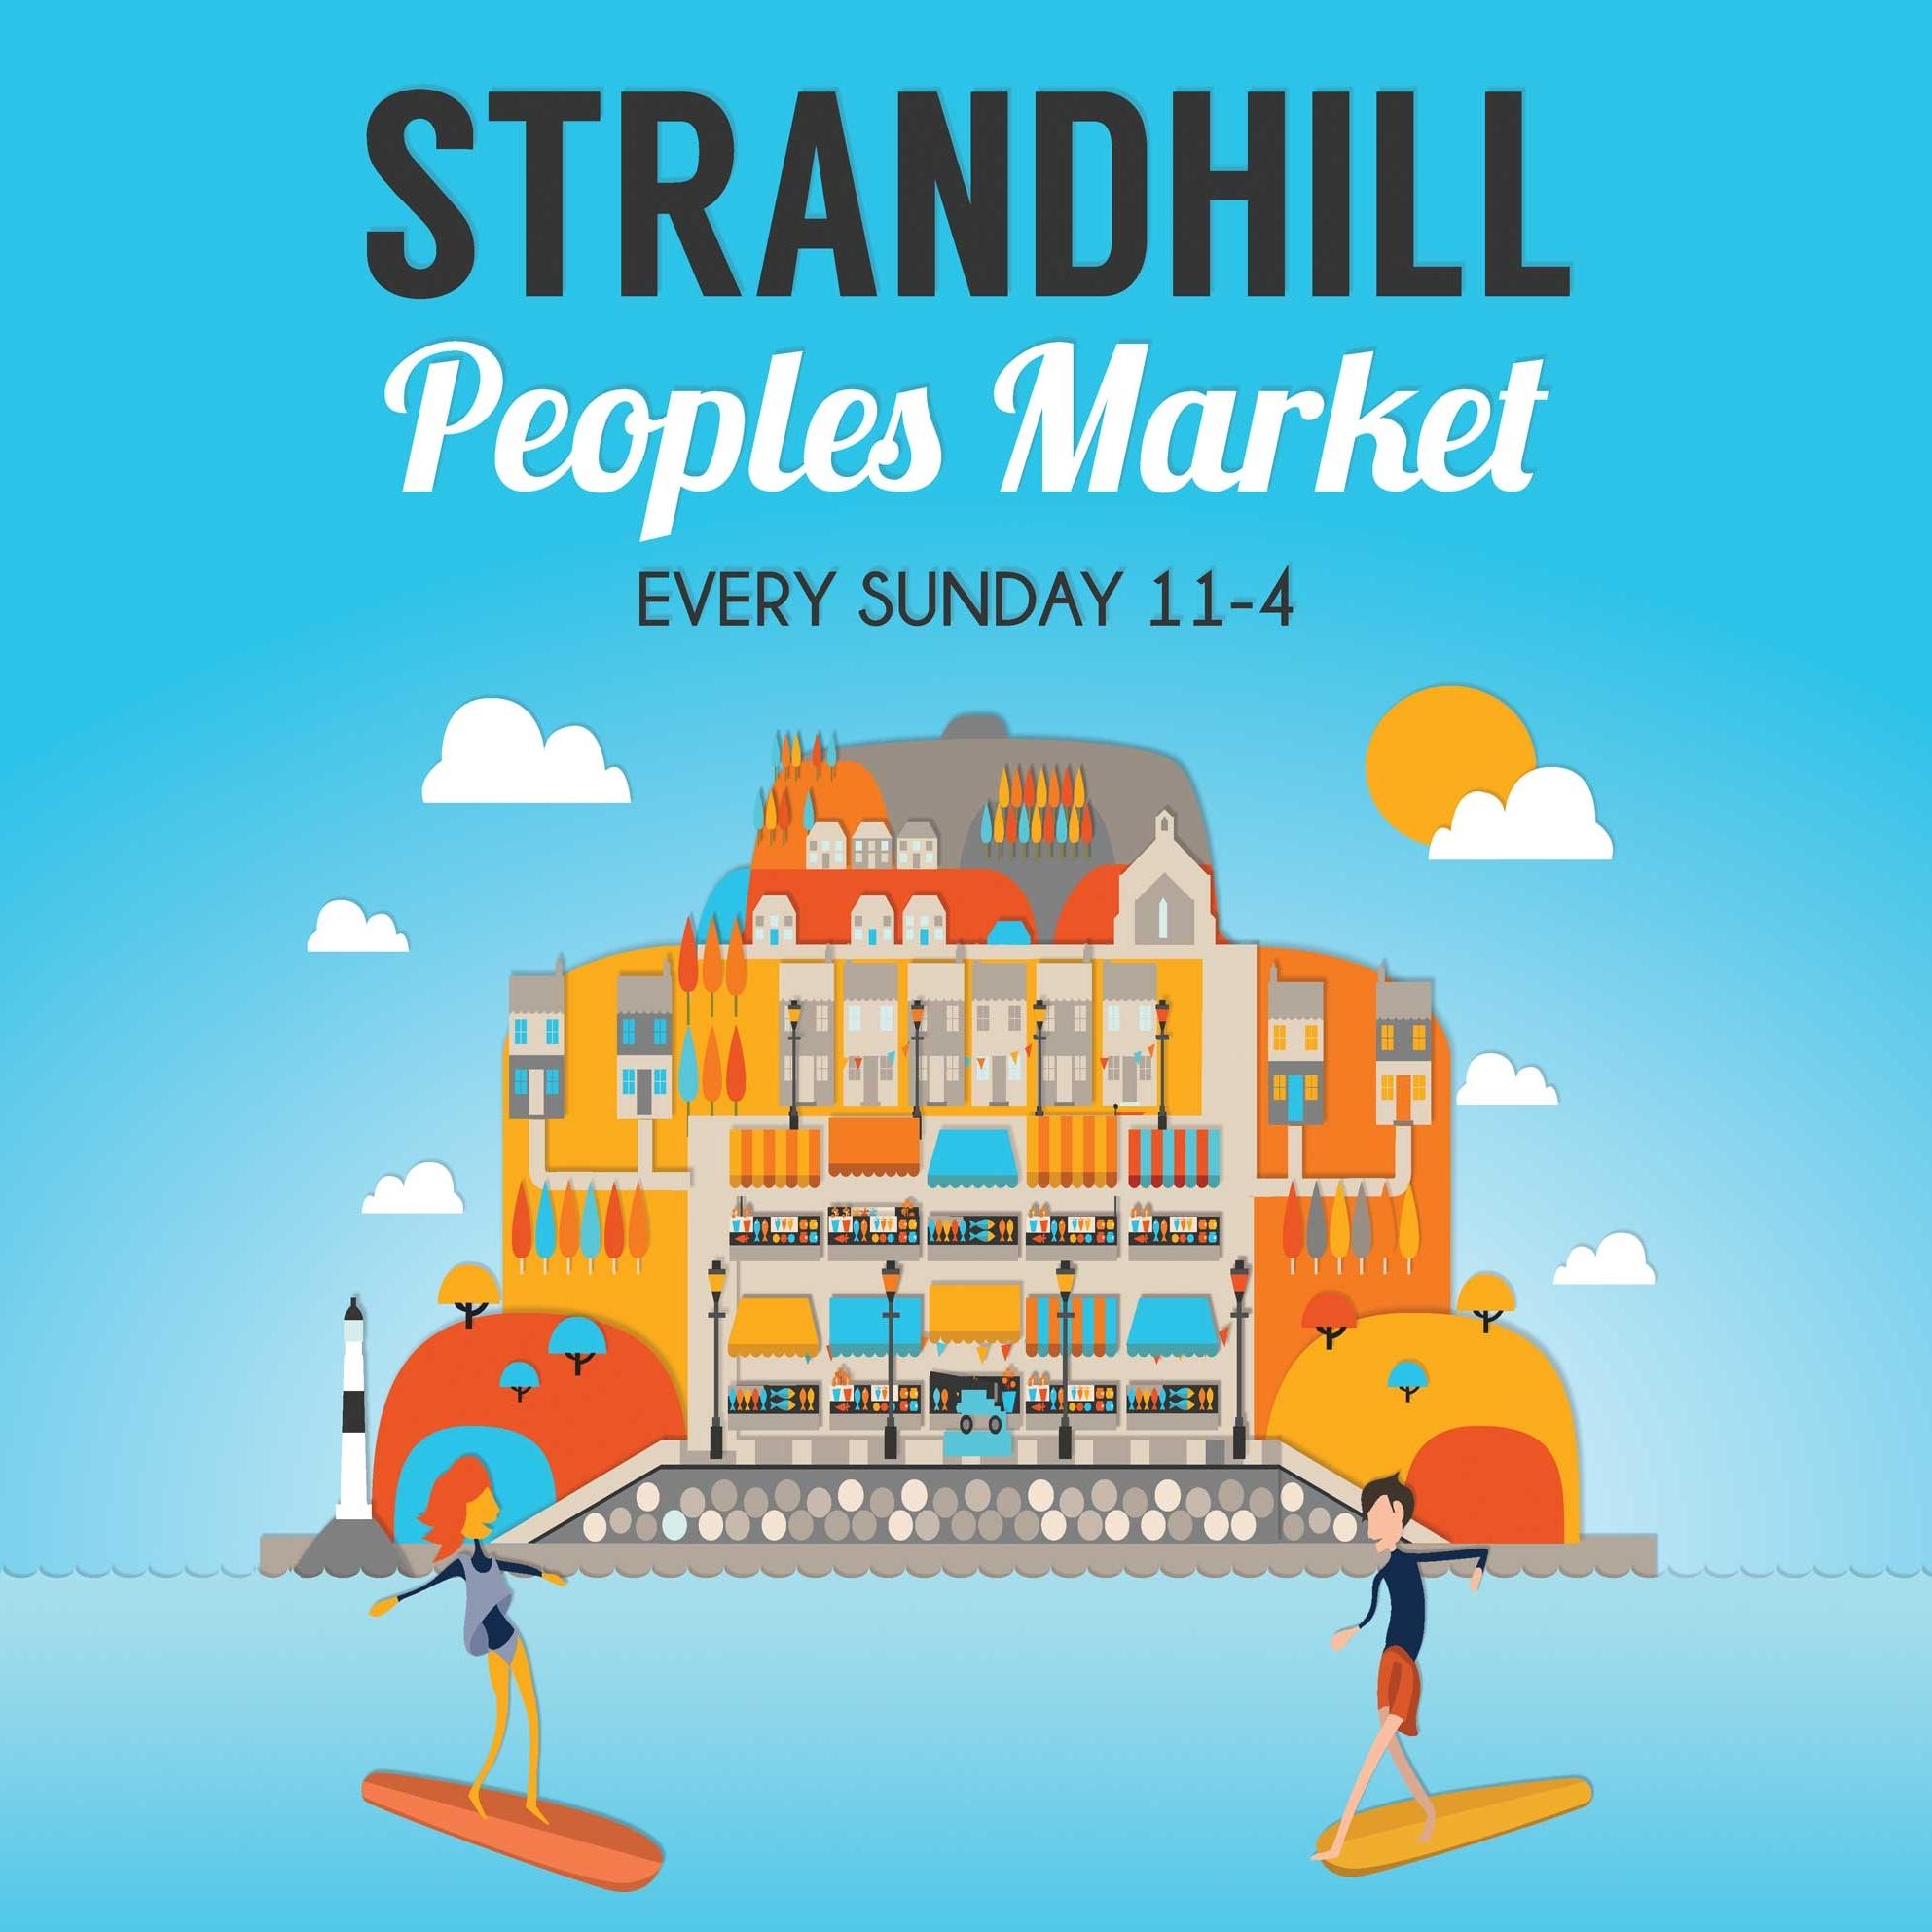 Reddin designs Strandhill peoples market poster